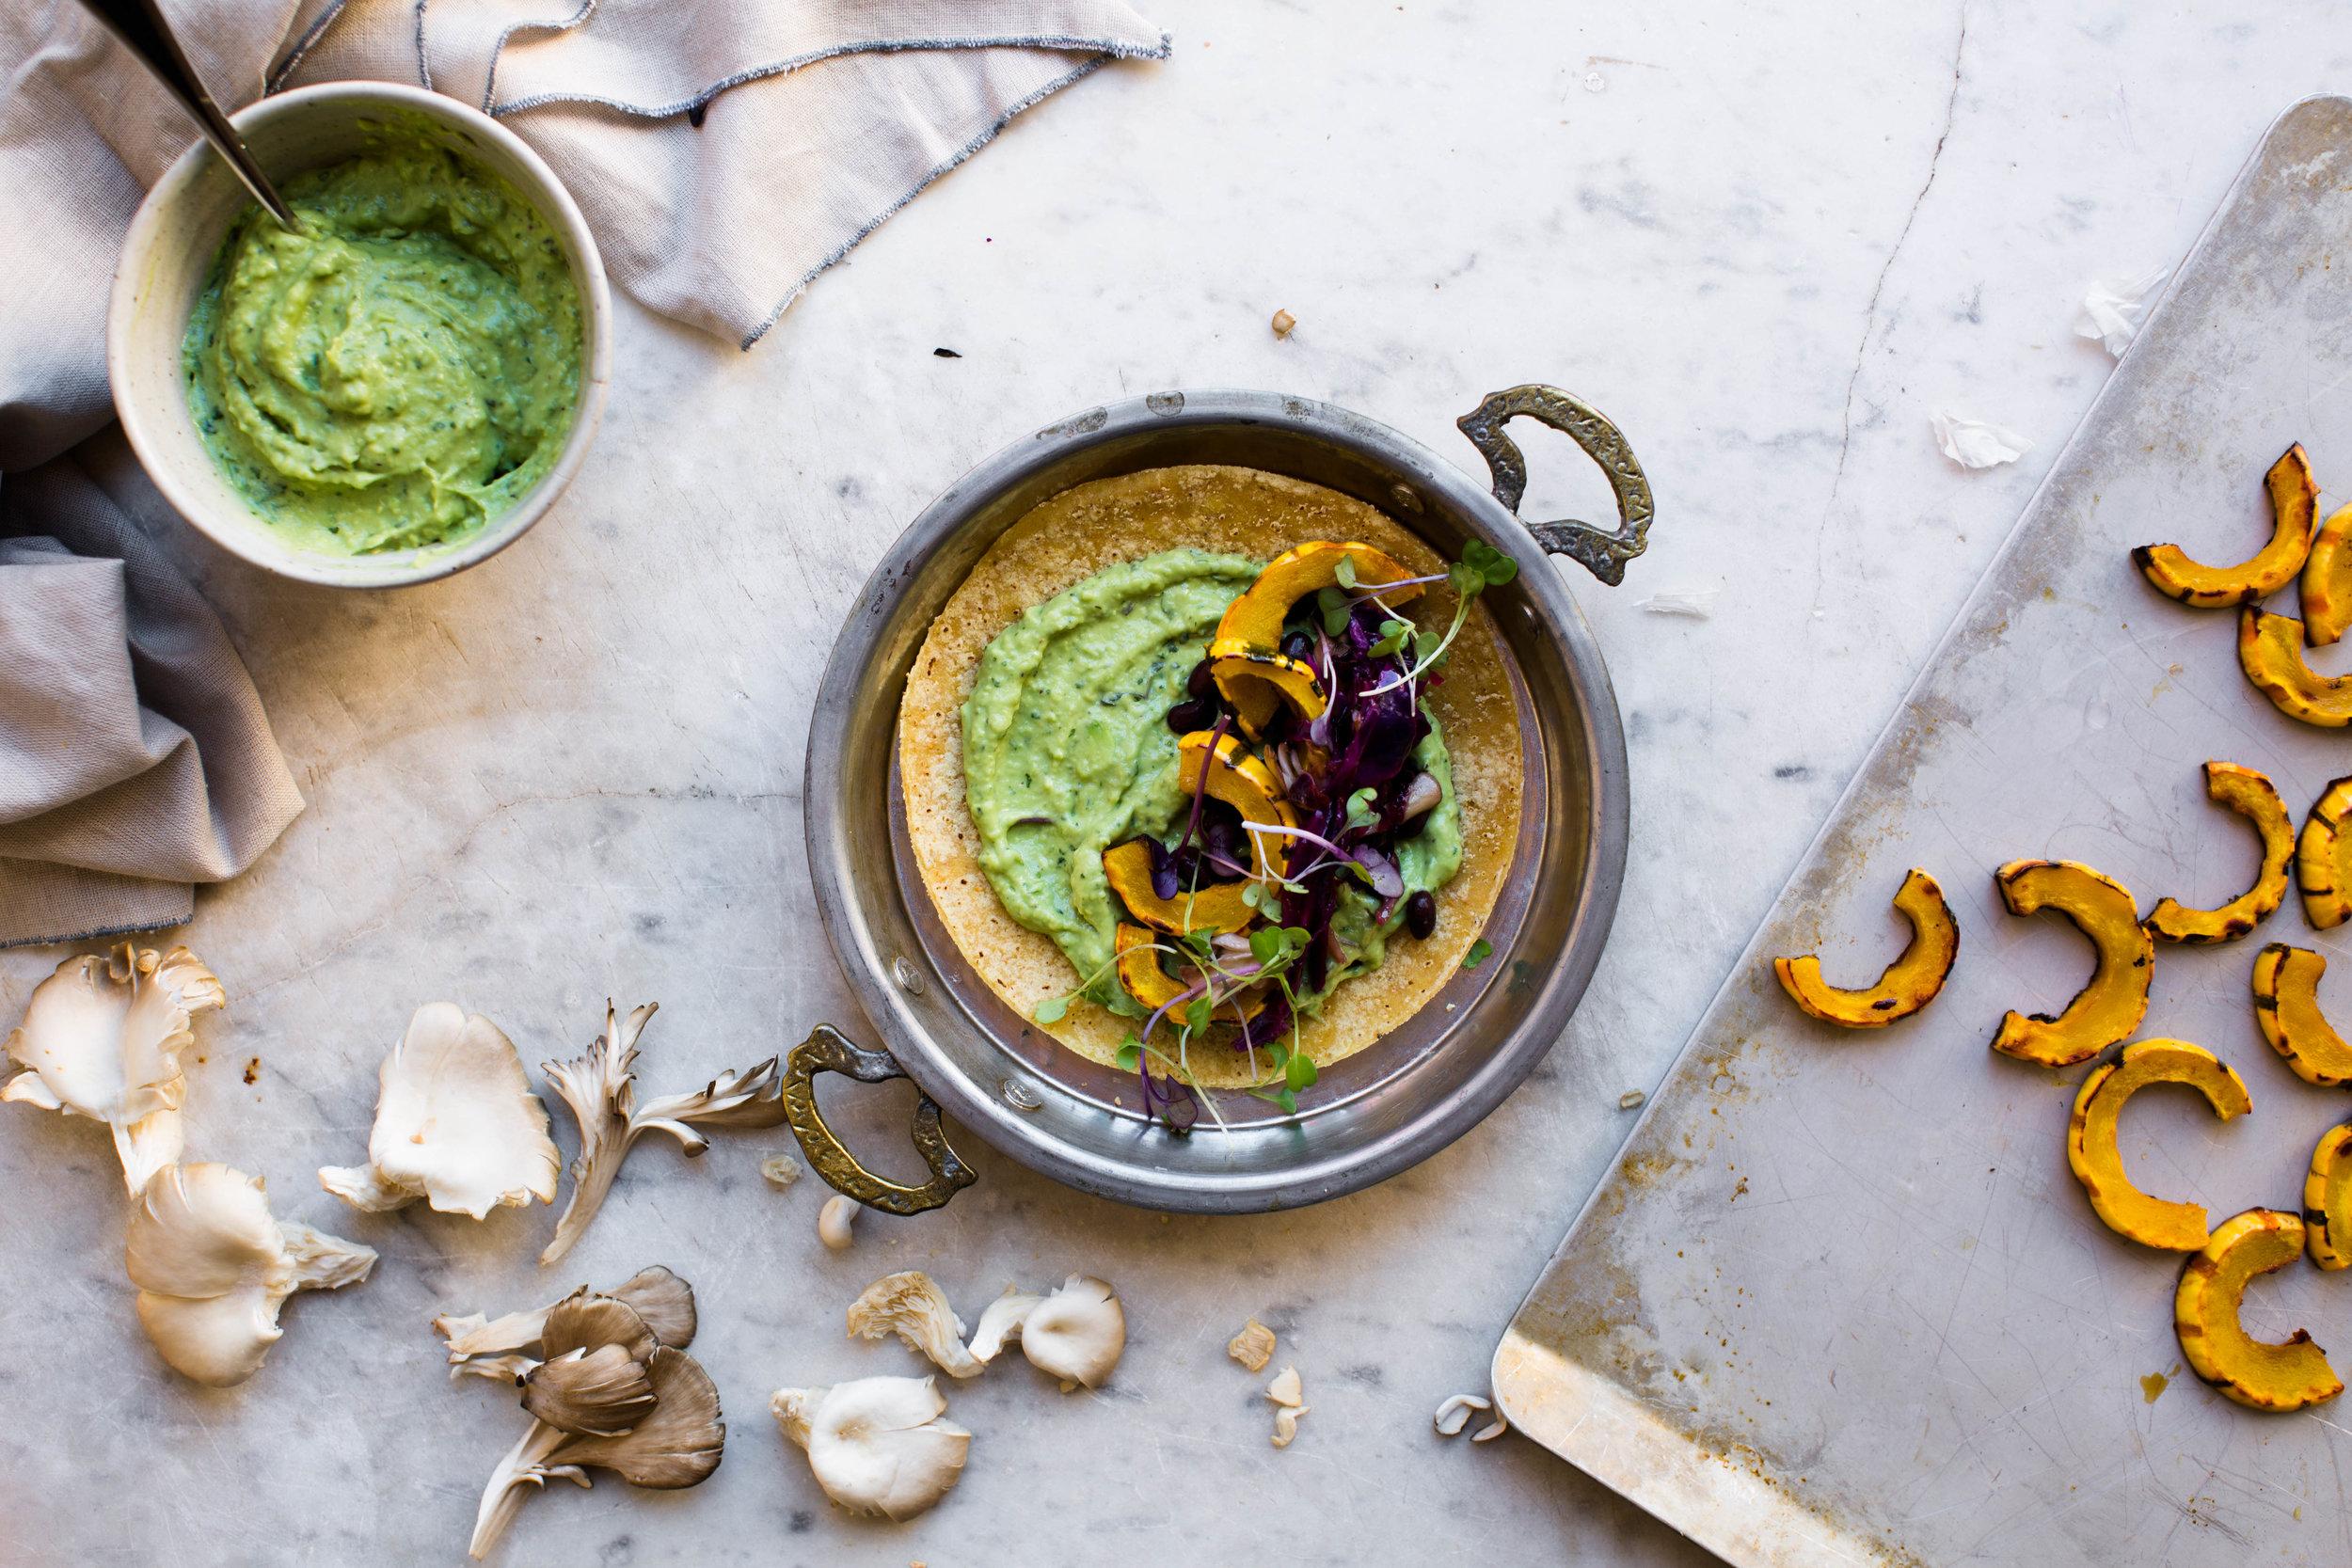 5-Fall-Breakfast-Tacos-with-Avocado-Cream-and-Squash | www.8thandlake.com